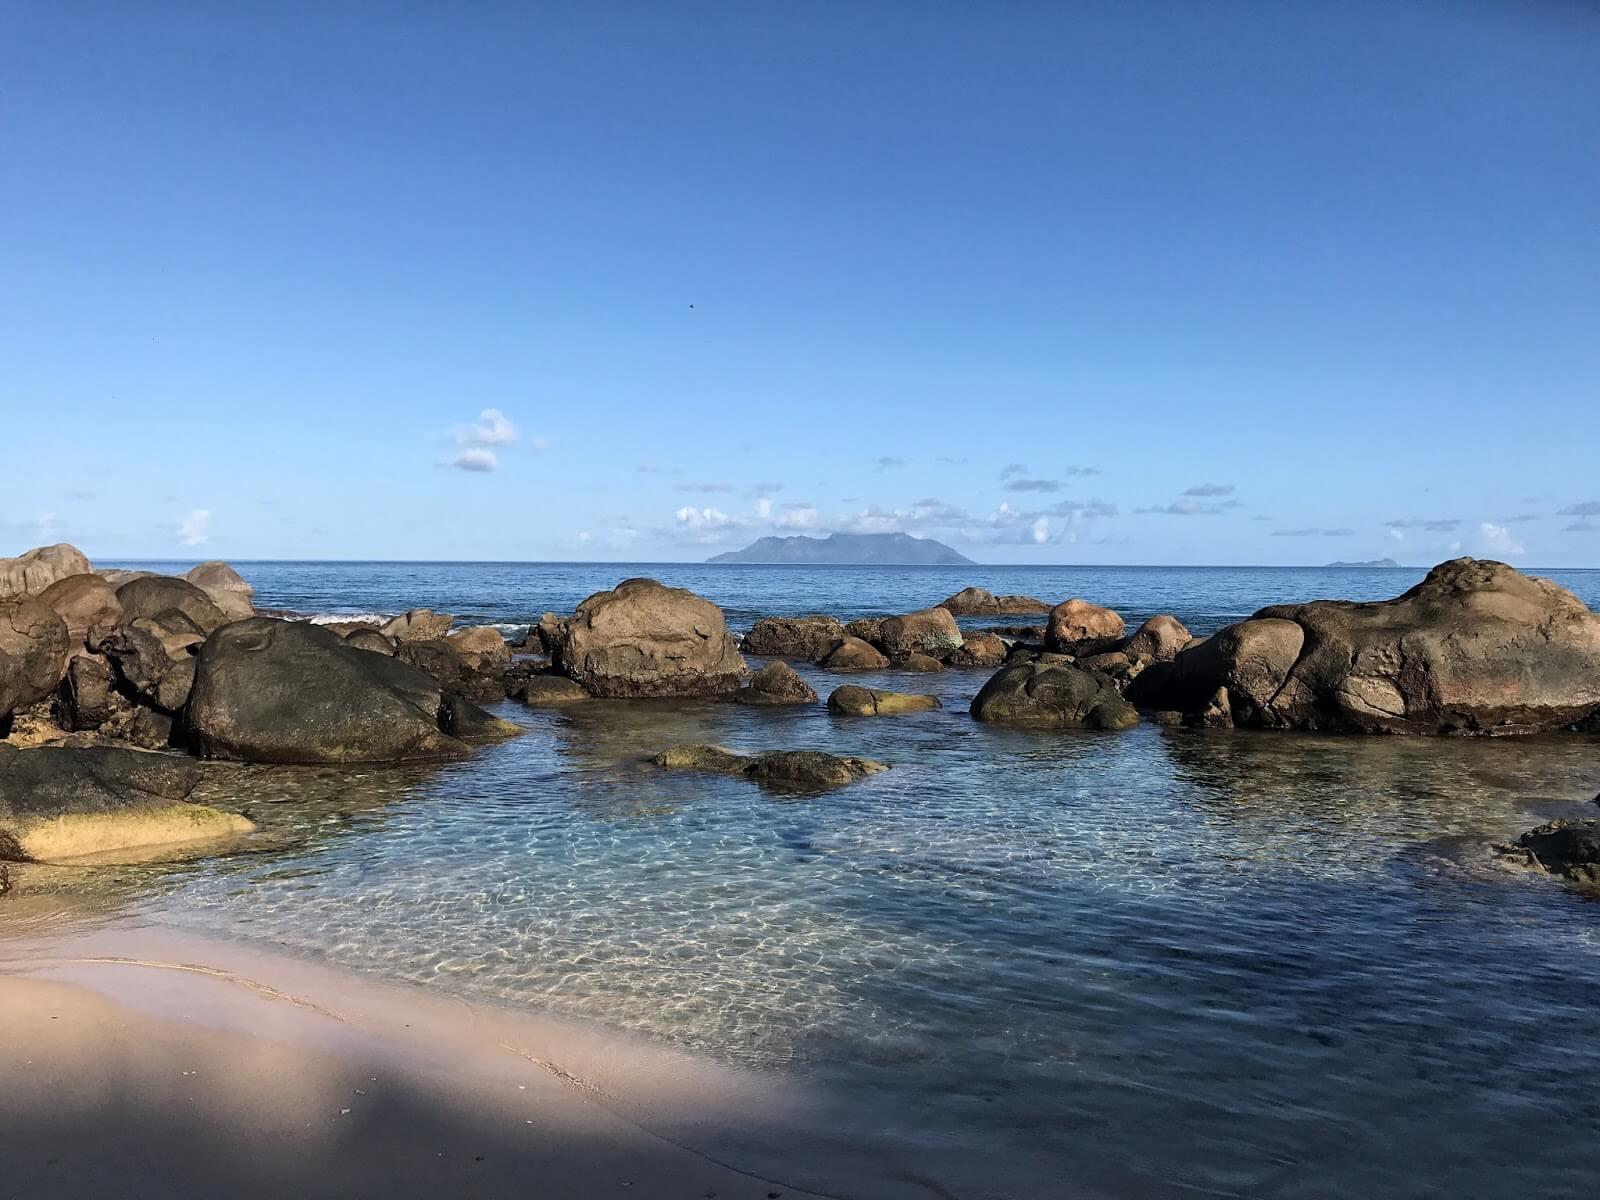 Anse Carana Beach at Mahe Island, Seychelles